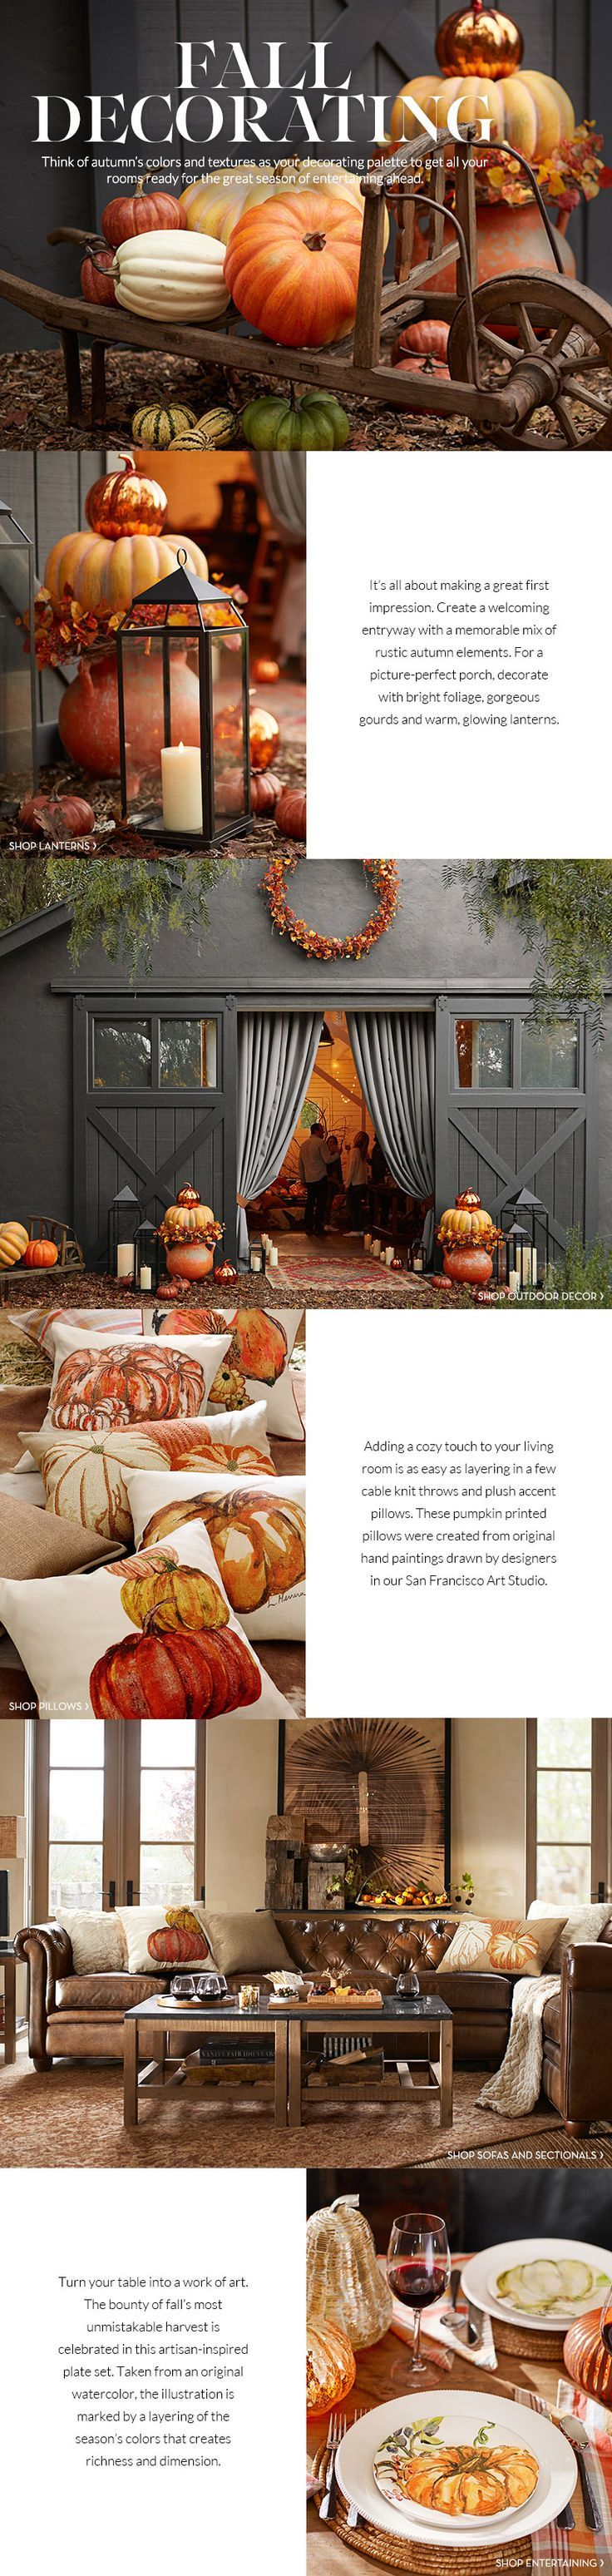 fall decor idea and wall decorations barn pottery popular design